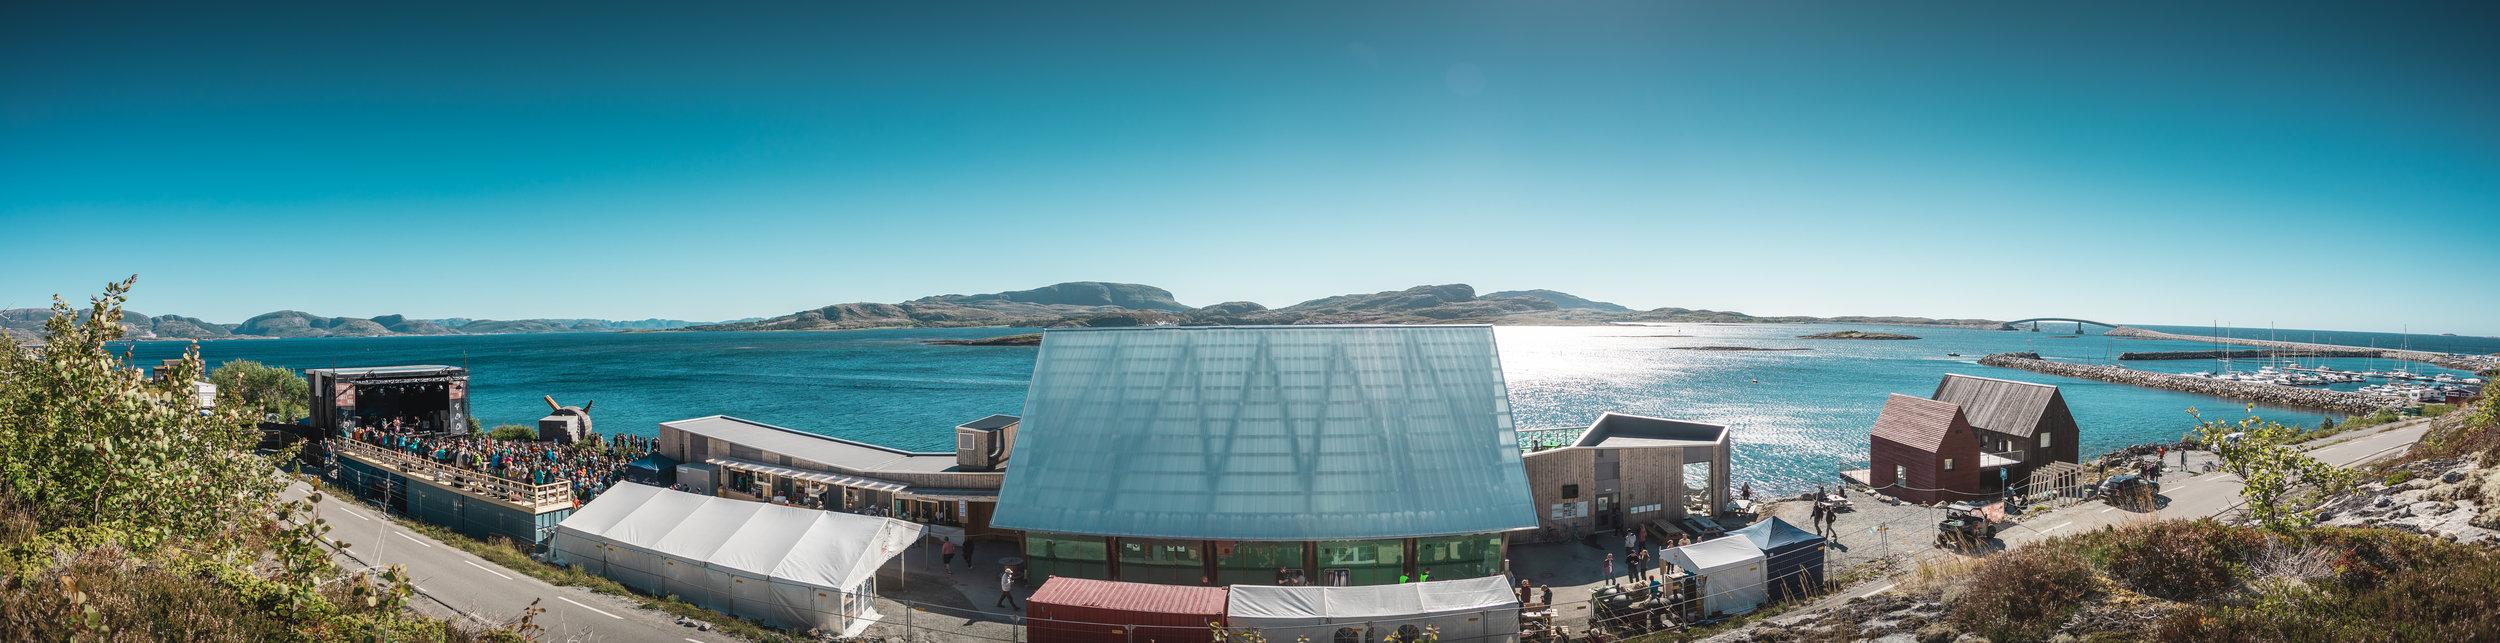 Stokkøya Festival - 28. - 29. juni 2019